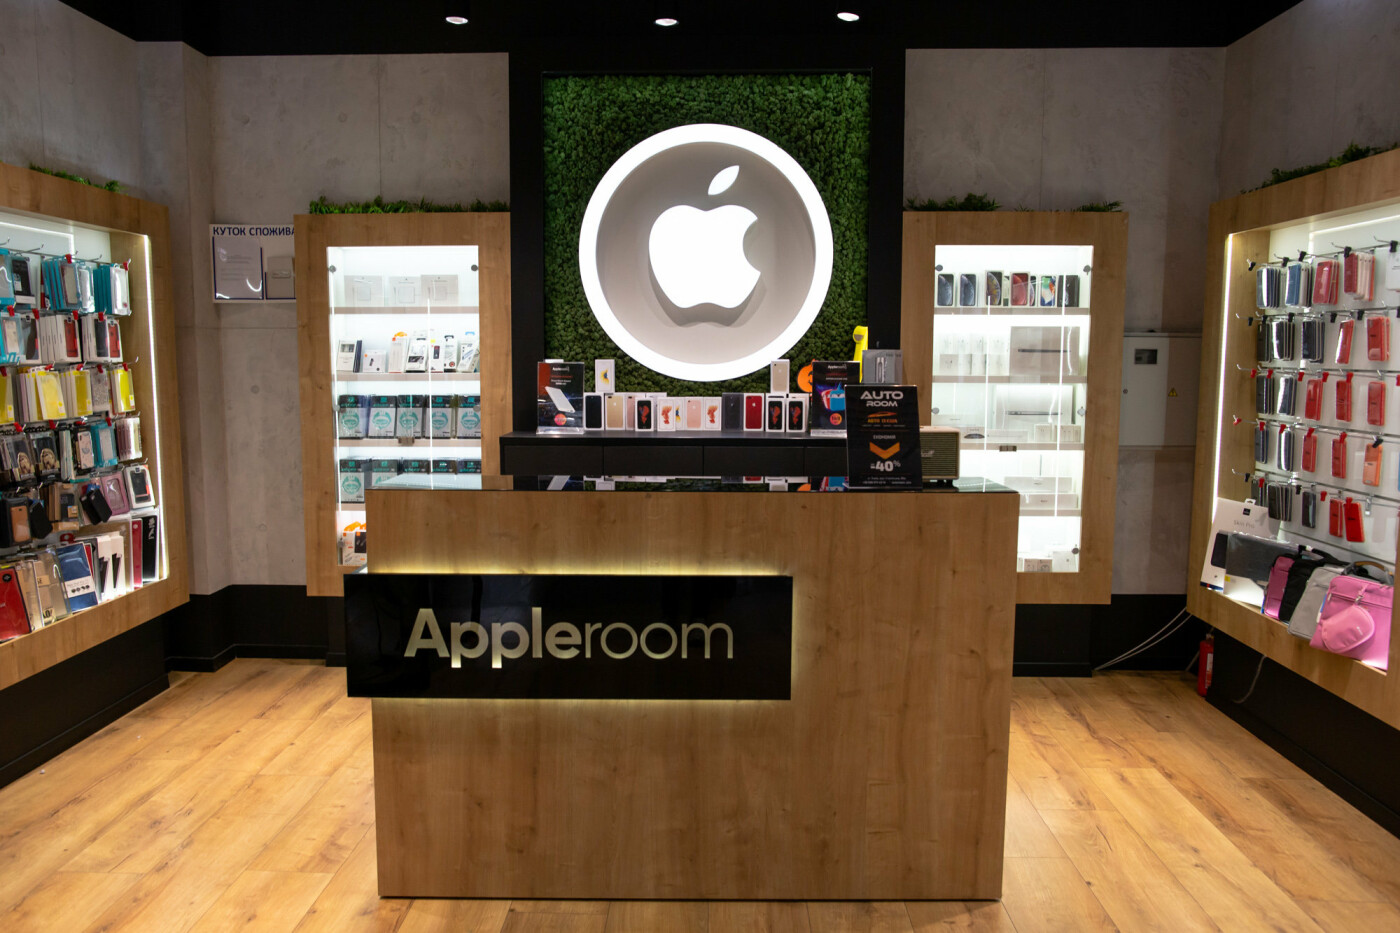 iPhone SE 2020 – найдешевший смартфон Apple вже в Apple Room, фото-5